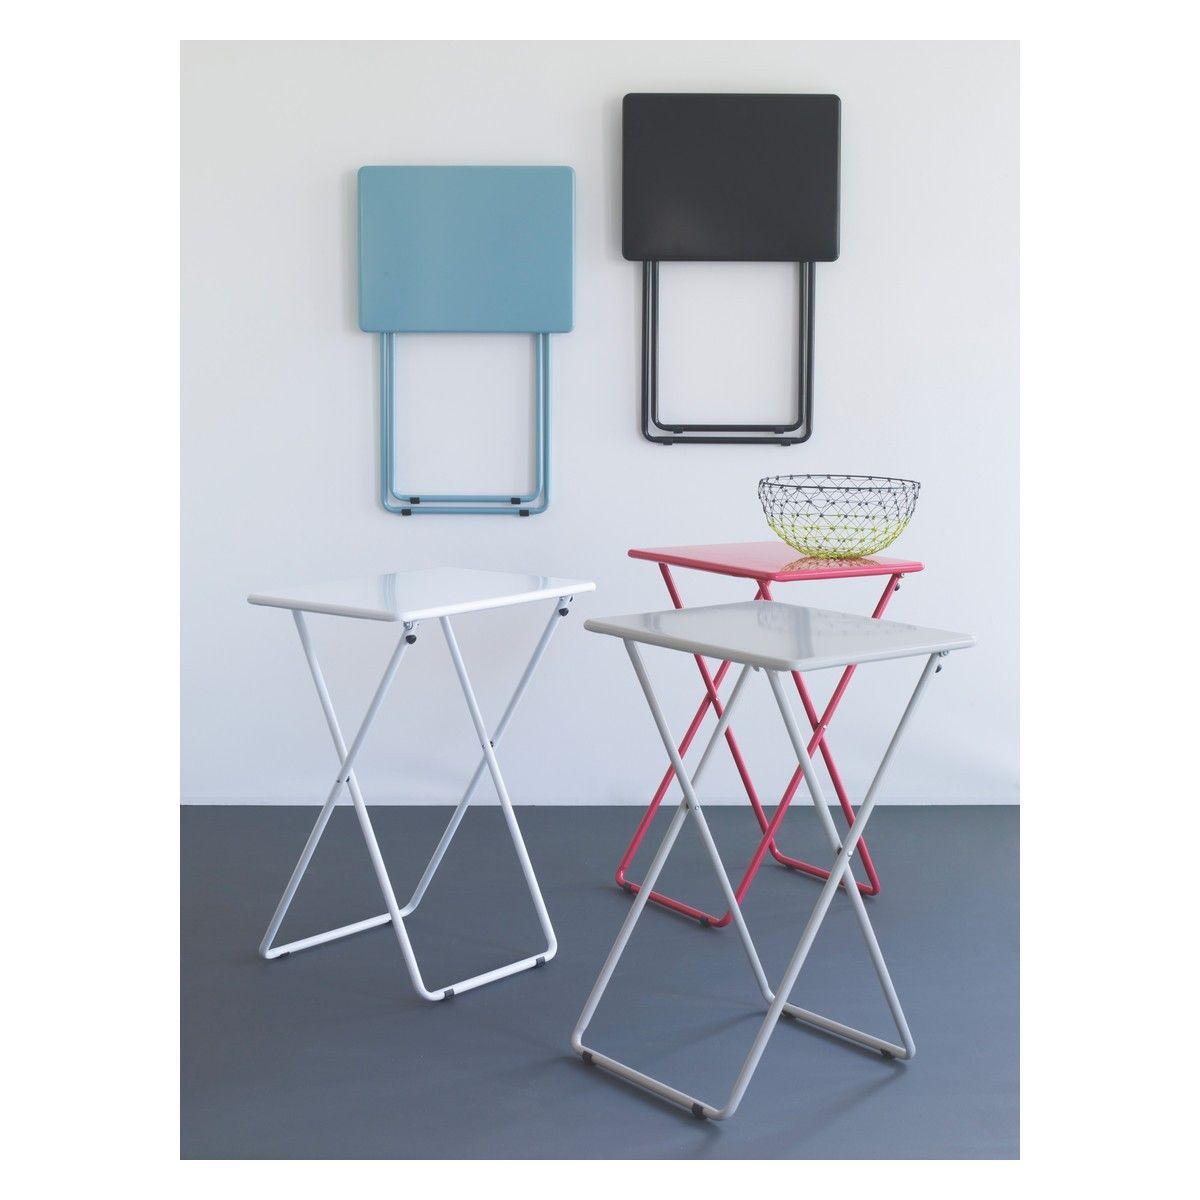 AIRO Sea Blue Metal Folding Table